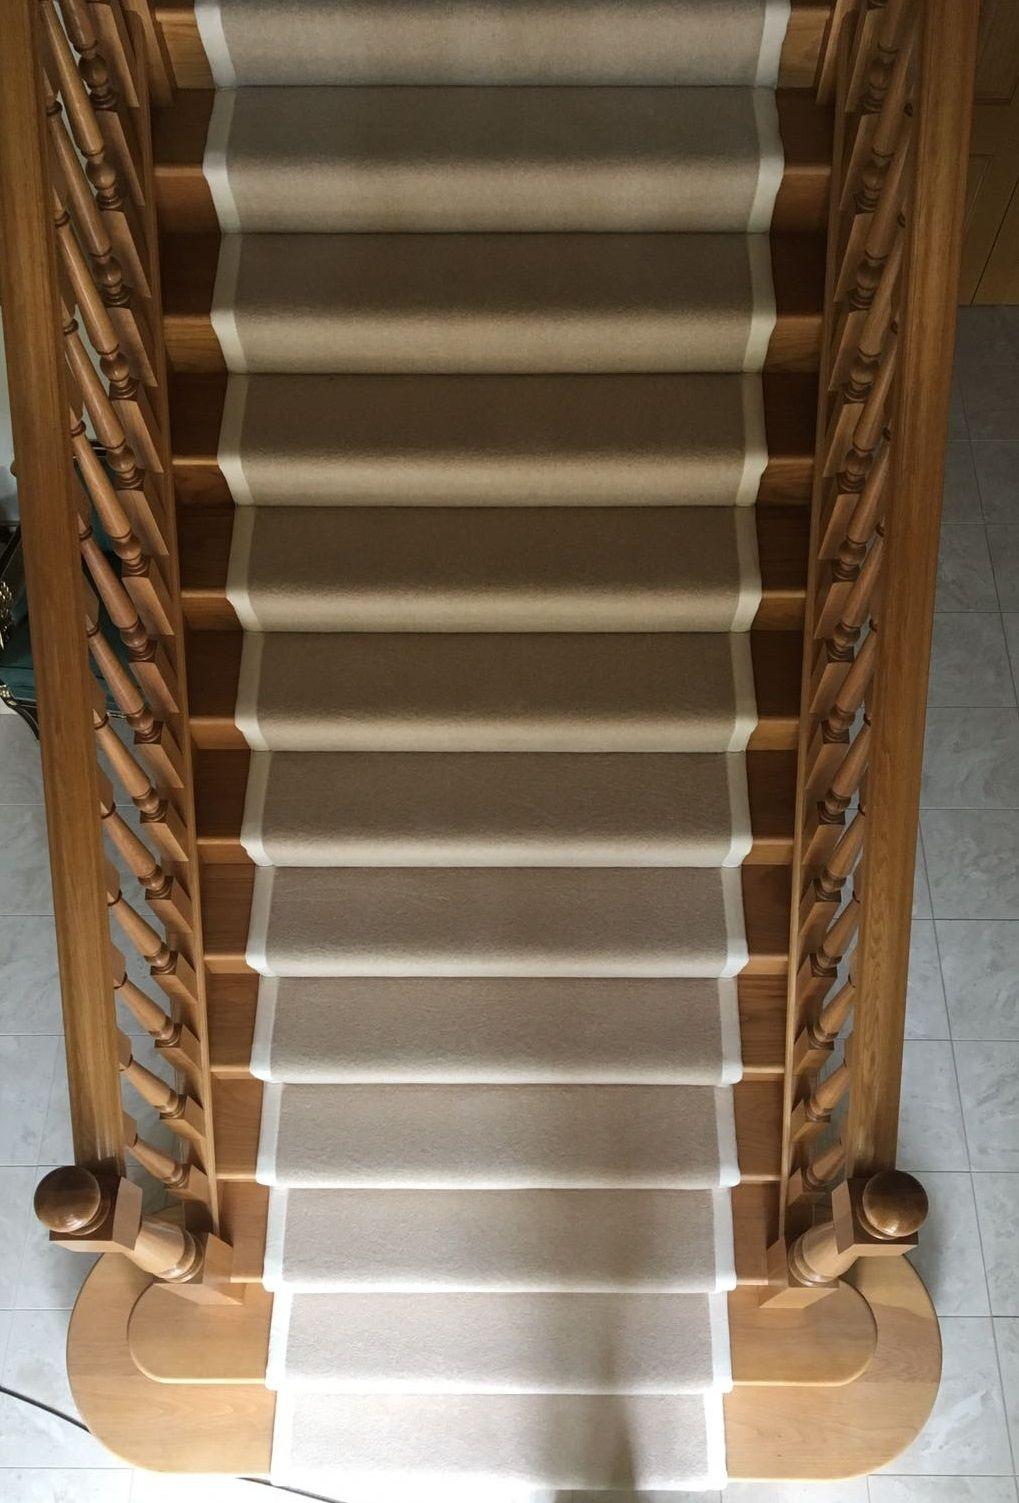 Best Cream Wool Carpet Fitted As Bespoke Stair Runner To Oak 400 x 300